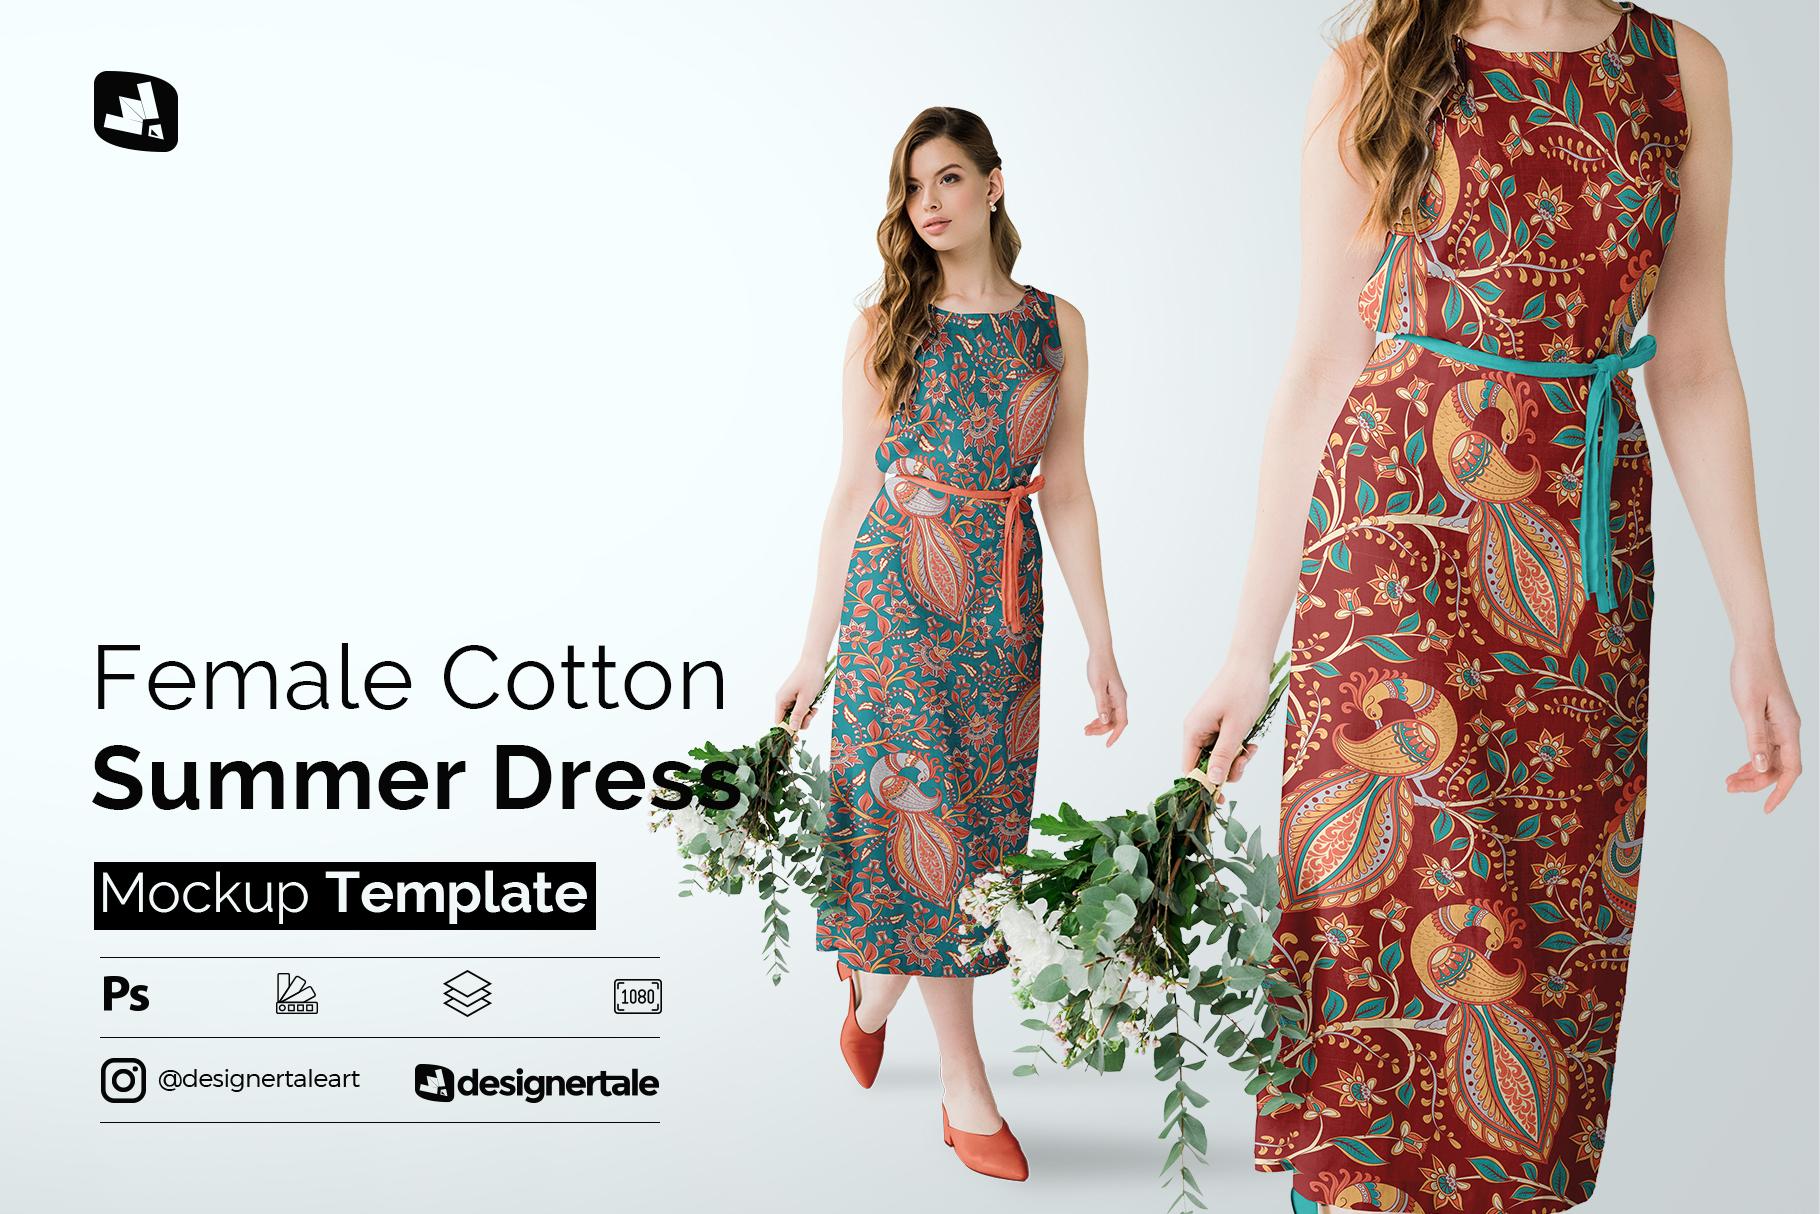 female cotton summer dress mockup